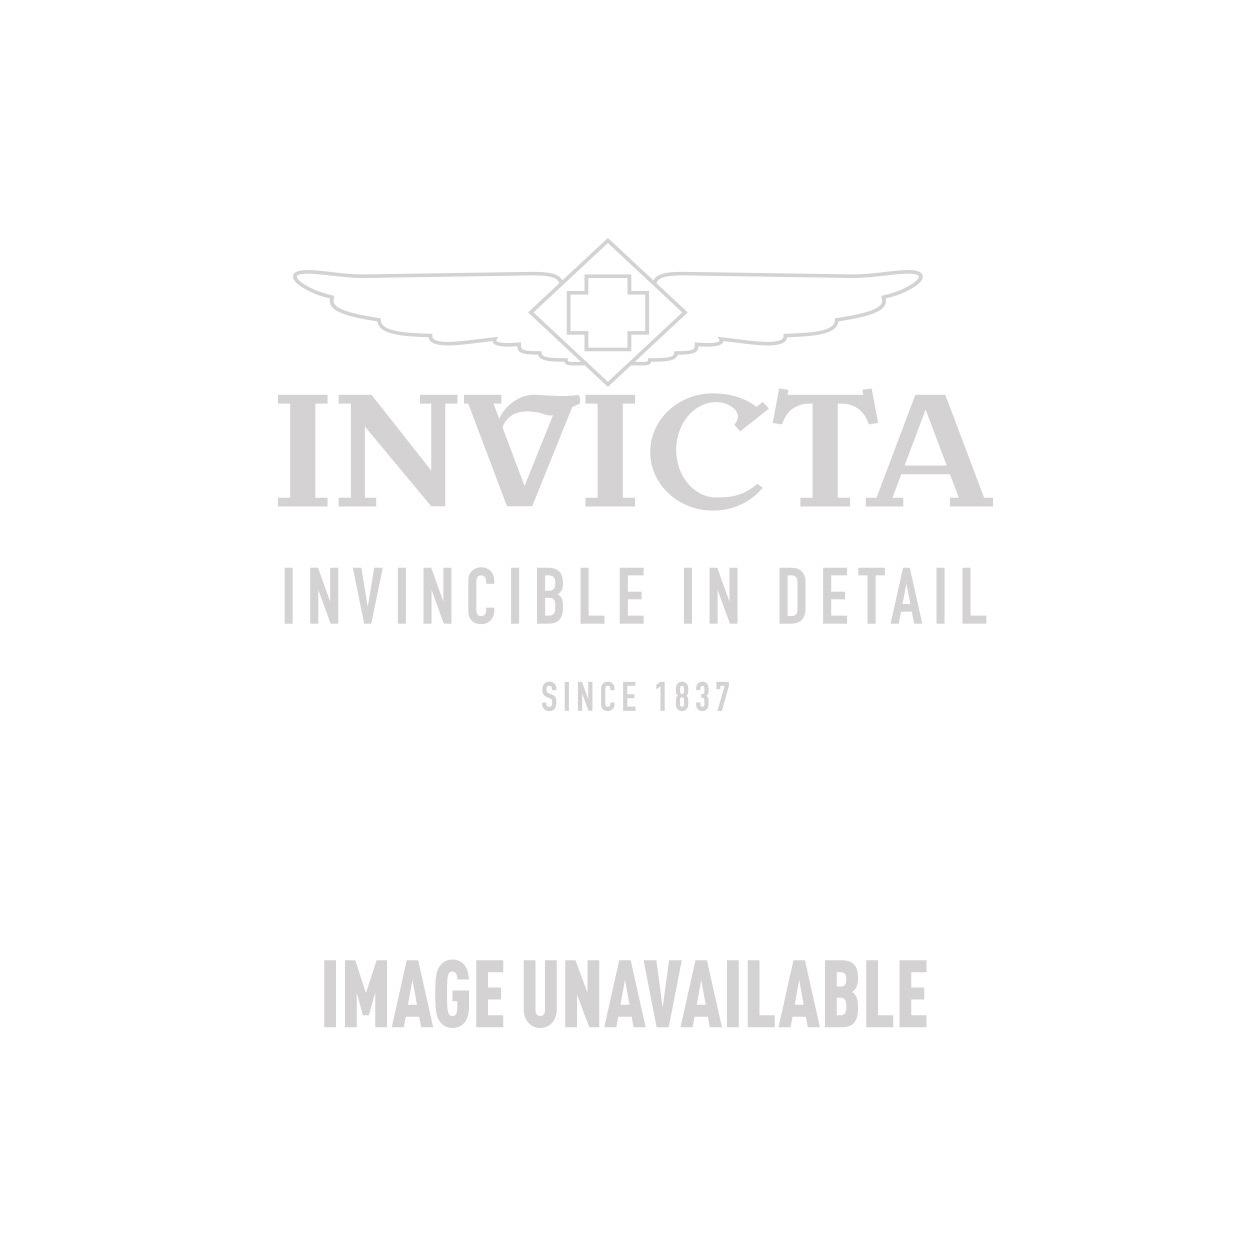 Invicta Akula Swiss Made Quartz Watch - Black case with Olive Green tone Silicone band - Model 12030